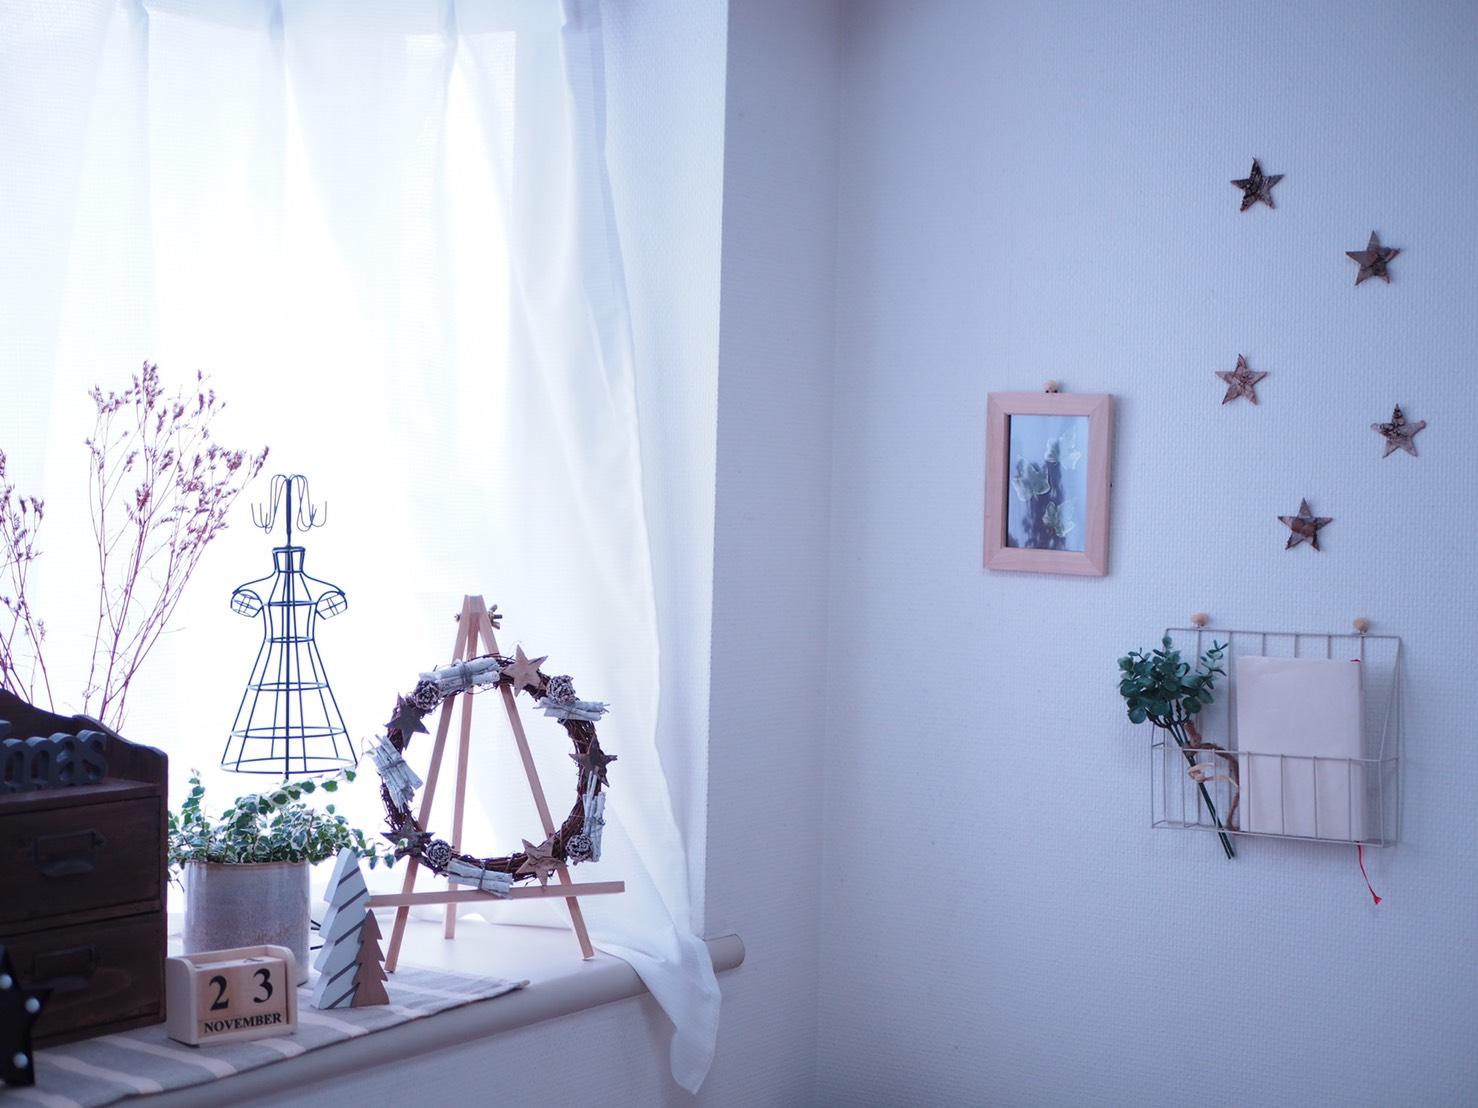 【#Seria】可愛すぎるセリアの新作itemでクリスマスムードを楽しむ♡_7